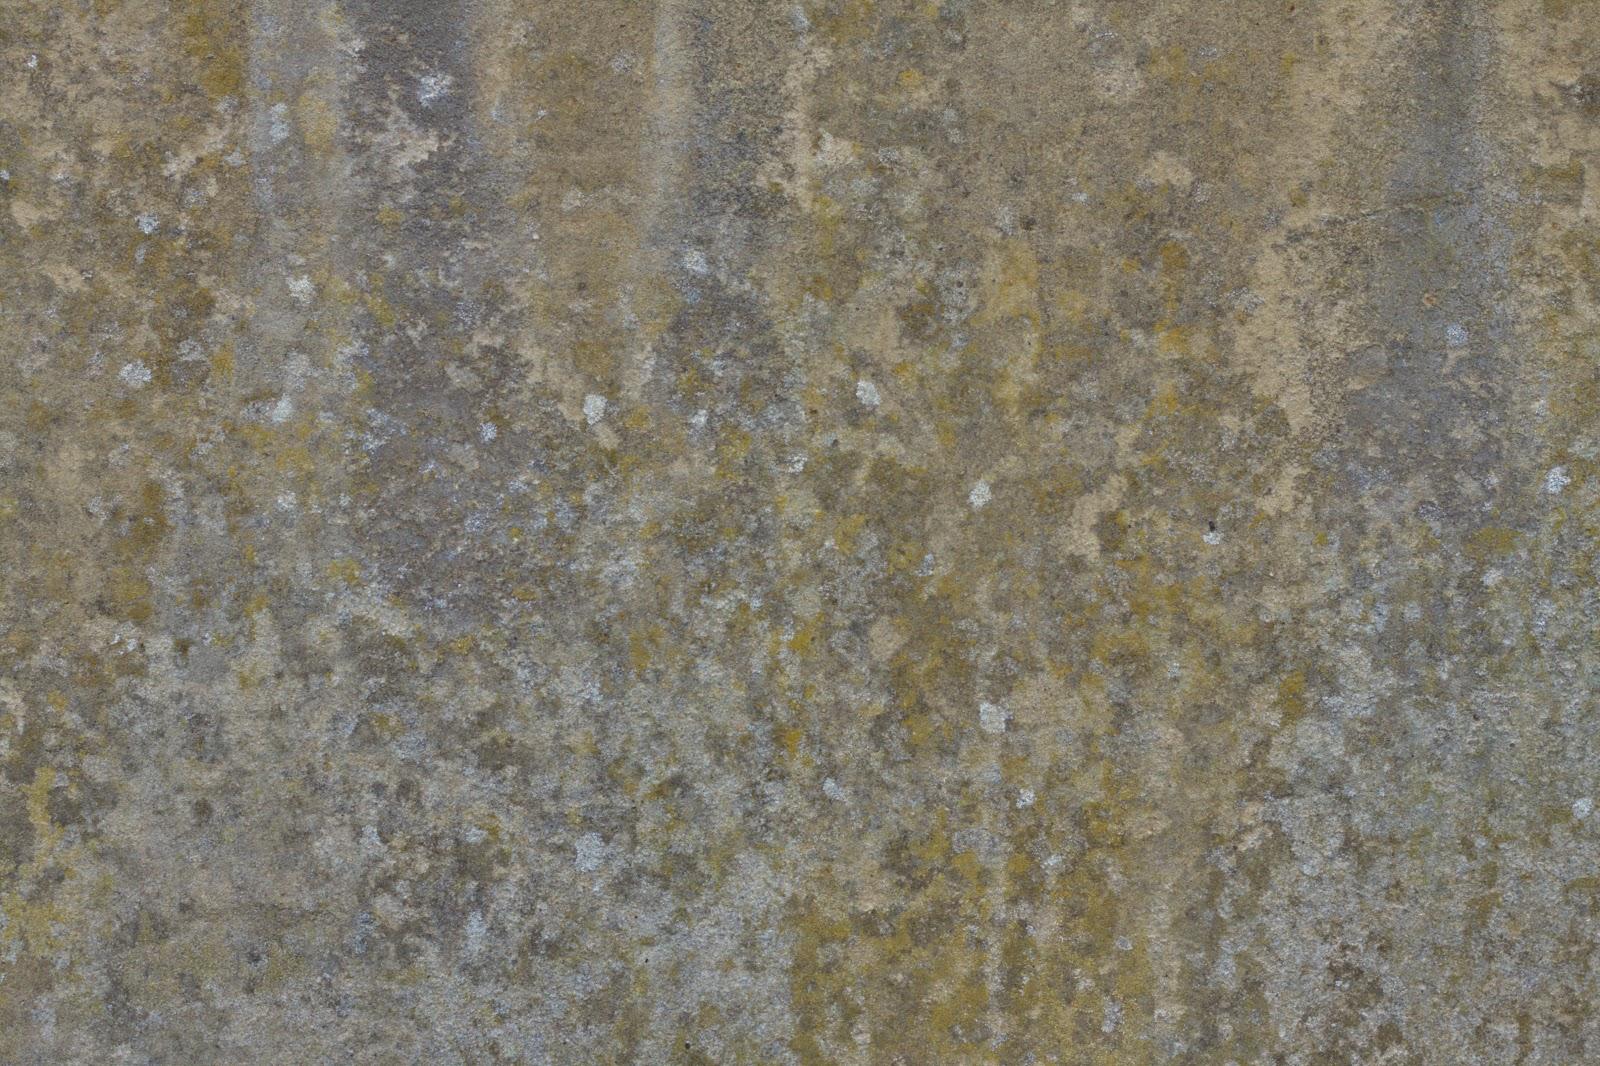 Wall plaster stucco grungy grunge moss texture 4770x3178